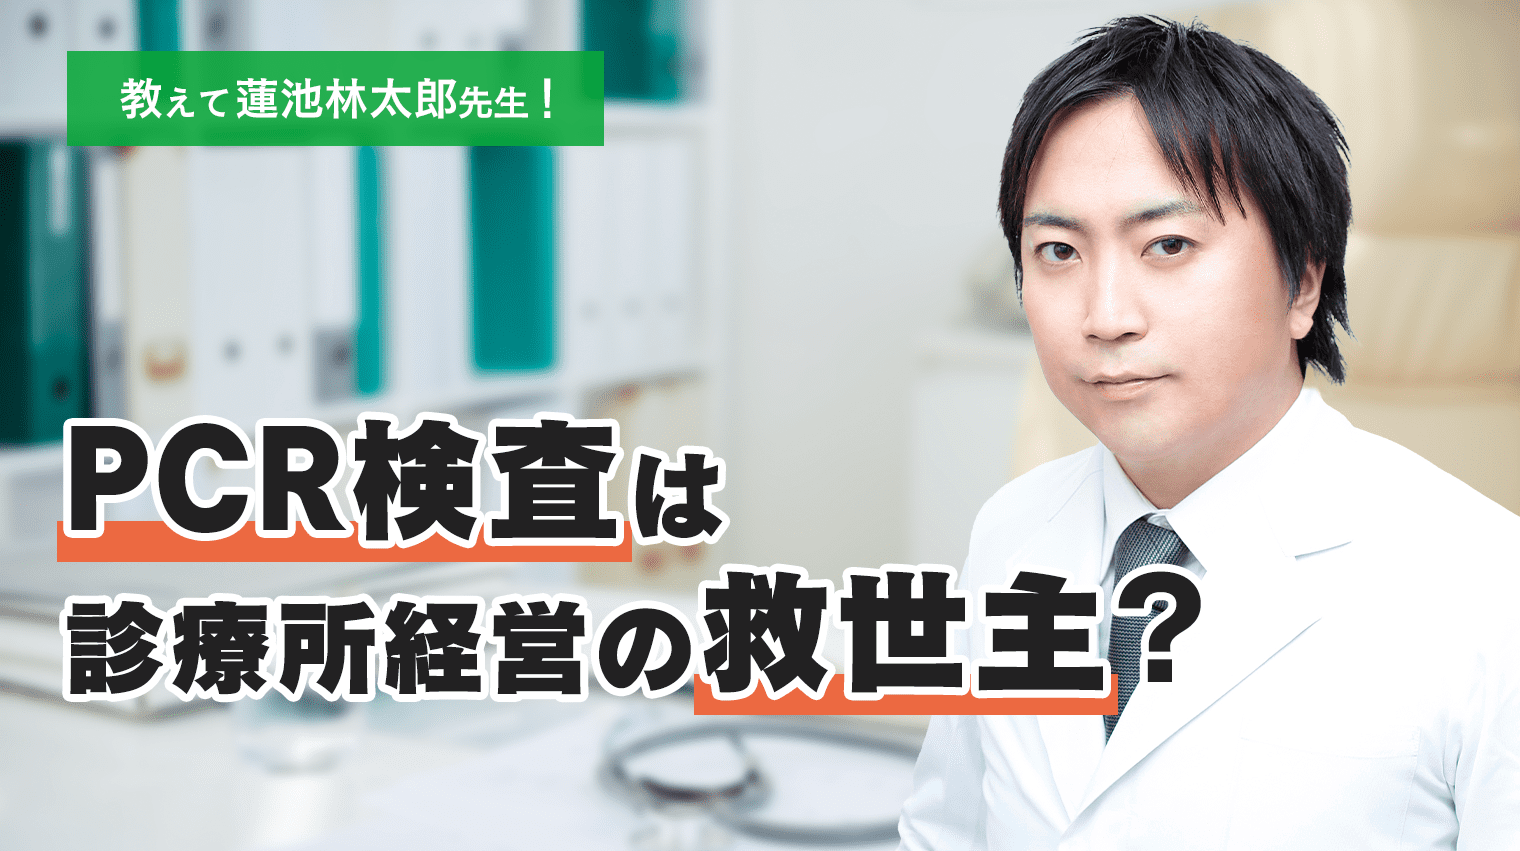 PCR検査は診療所経営の救世主?クリニックの理事長が語る|教えて蓮池林太郎先生!